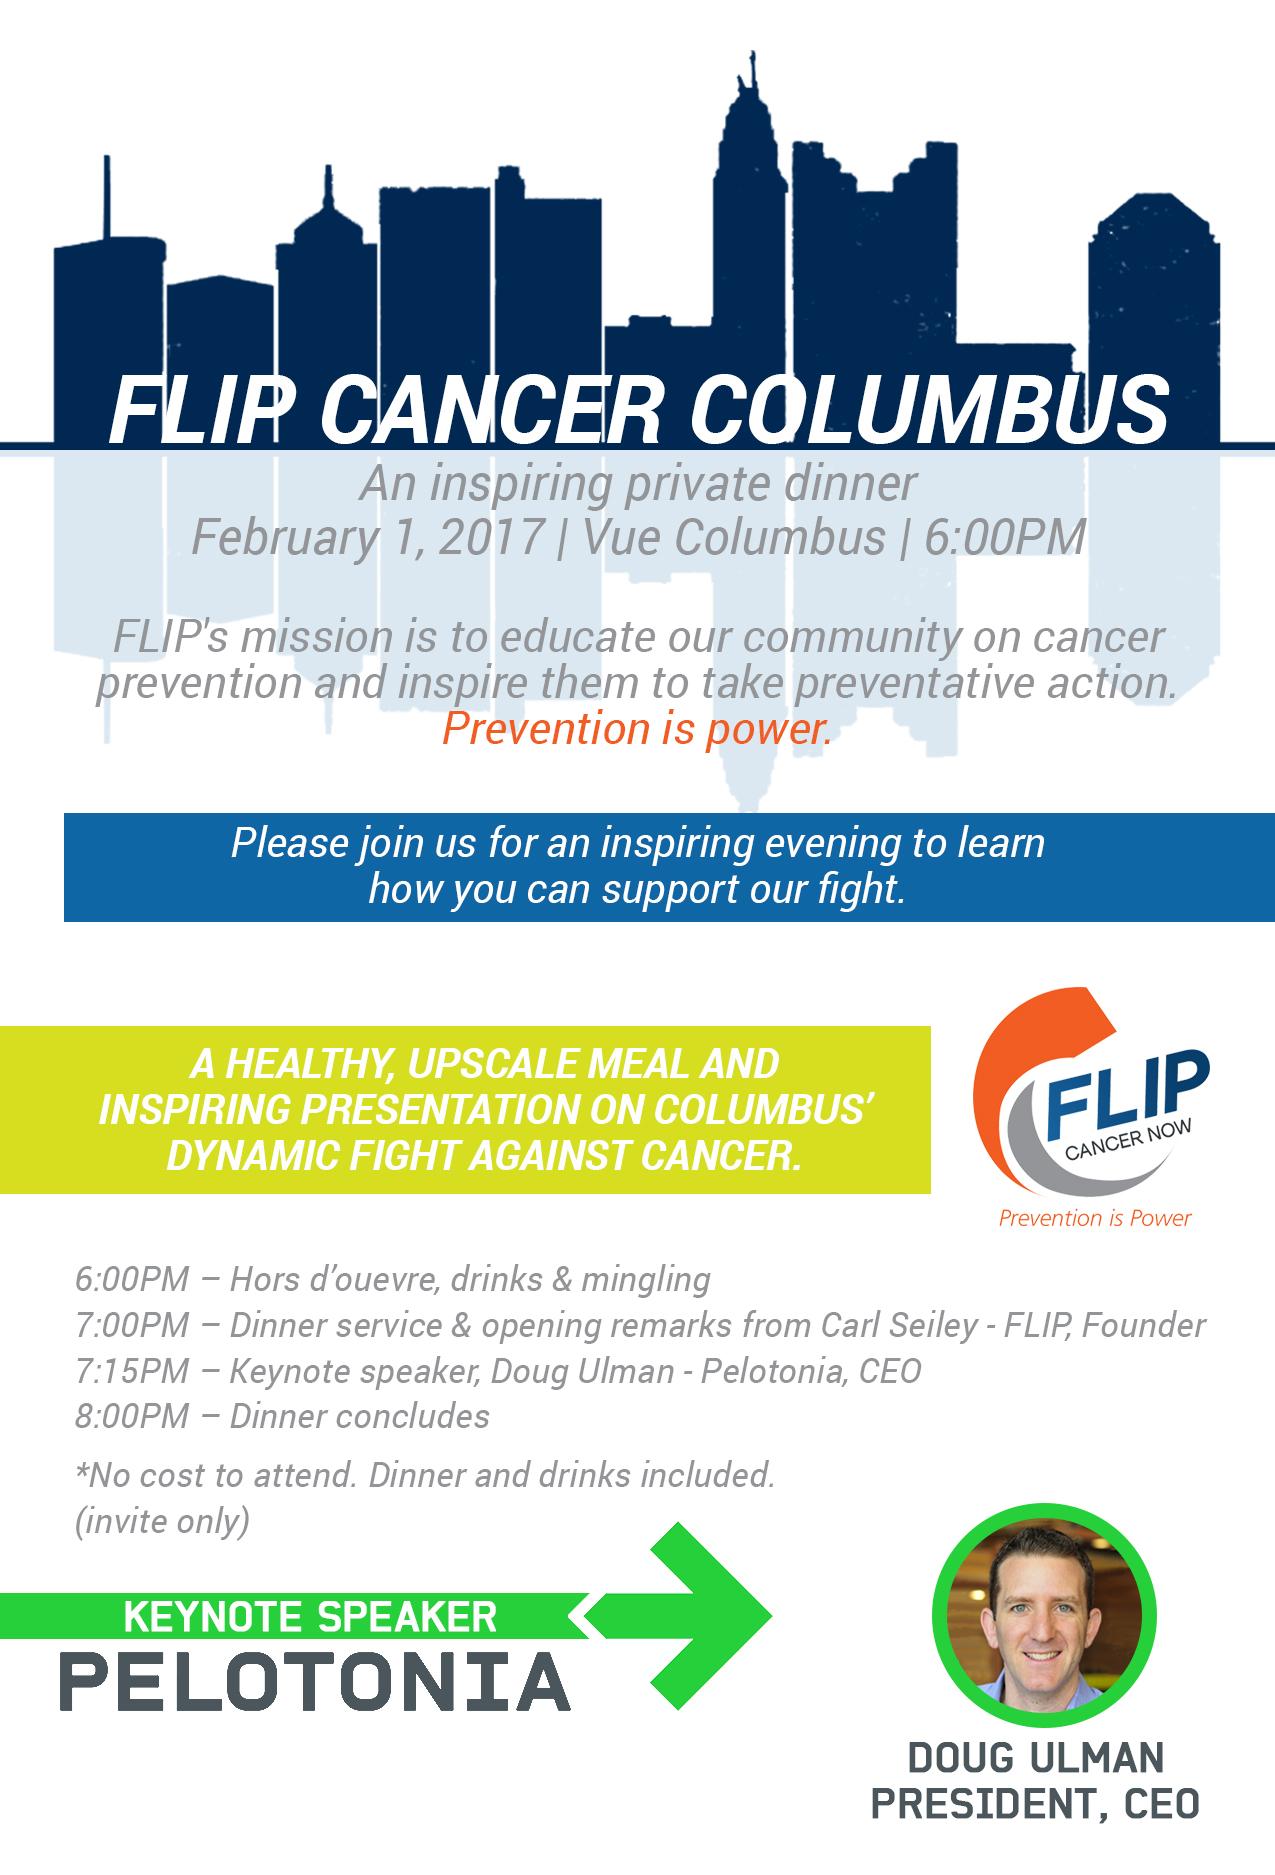 FLIP Cancer's Private Dinner - FLIP Cancer Now